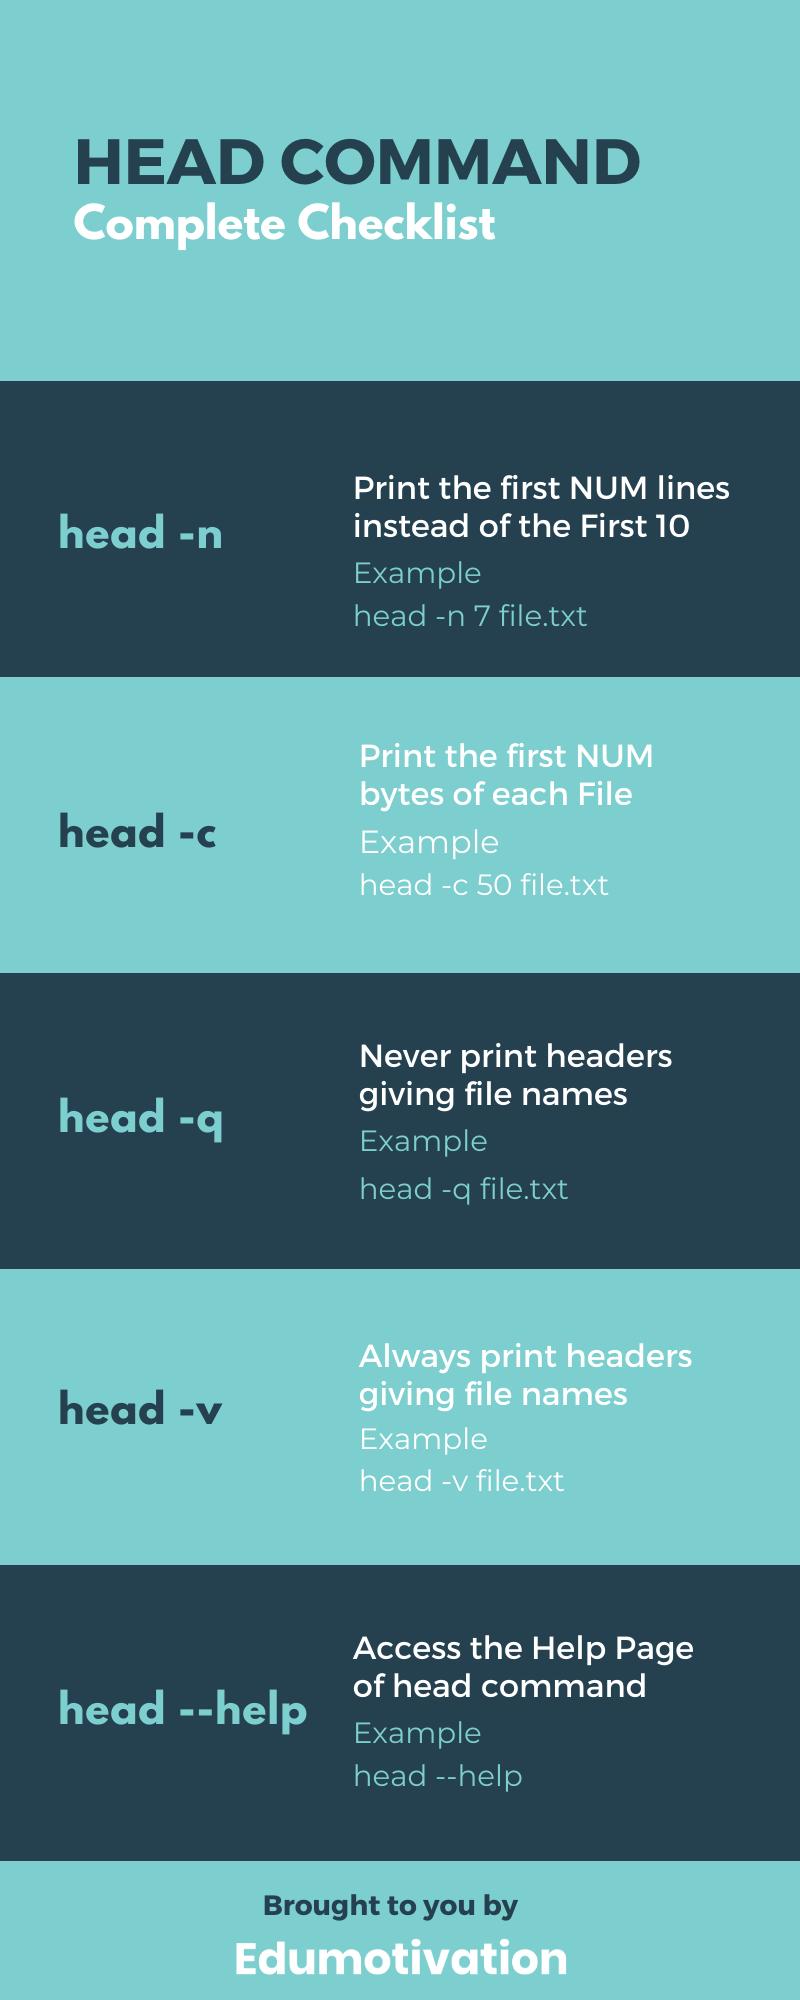 Head command Infographic